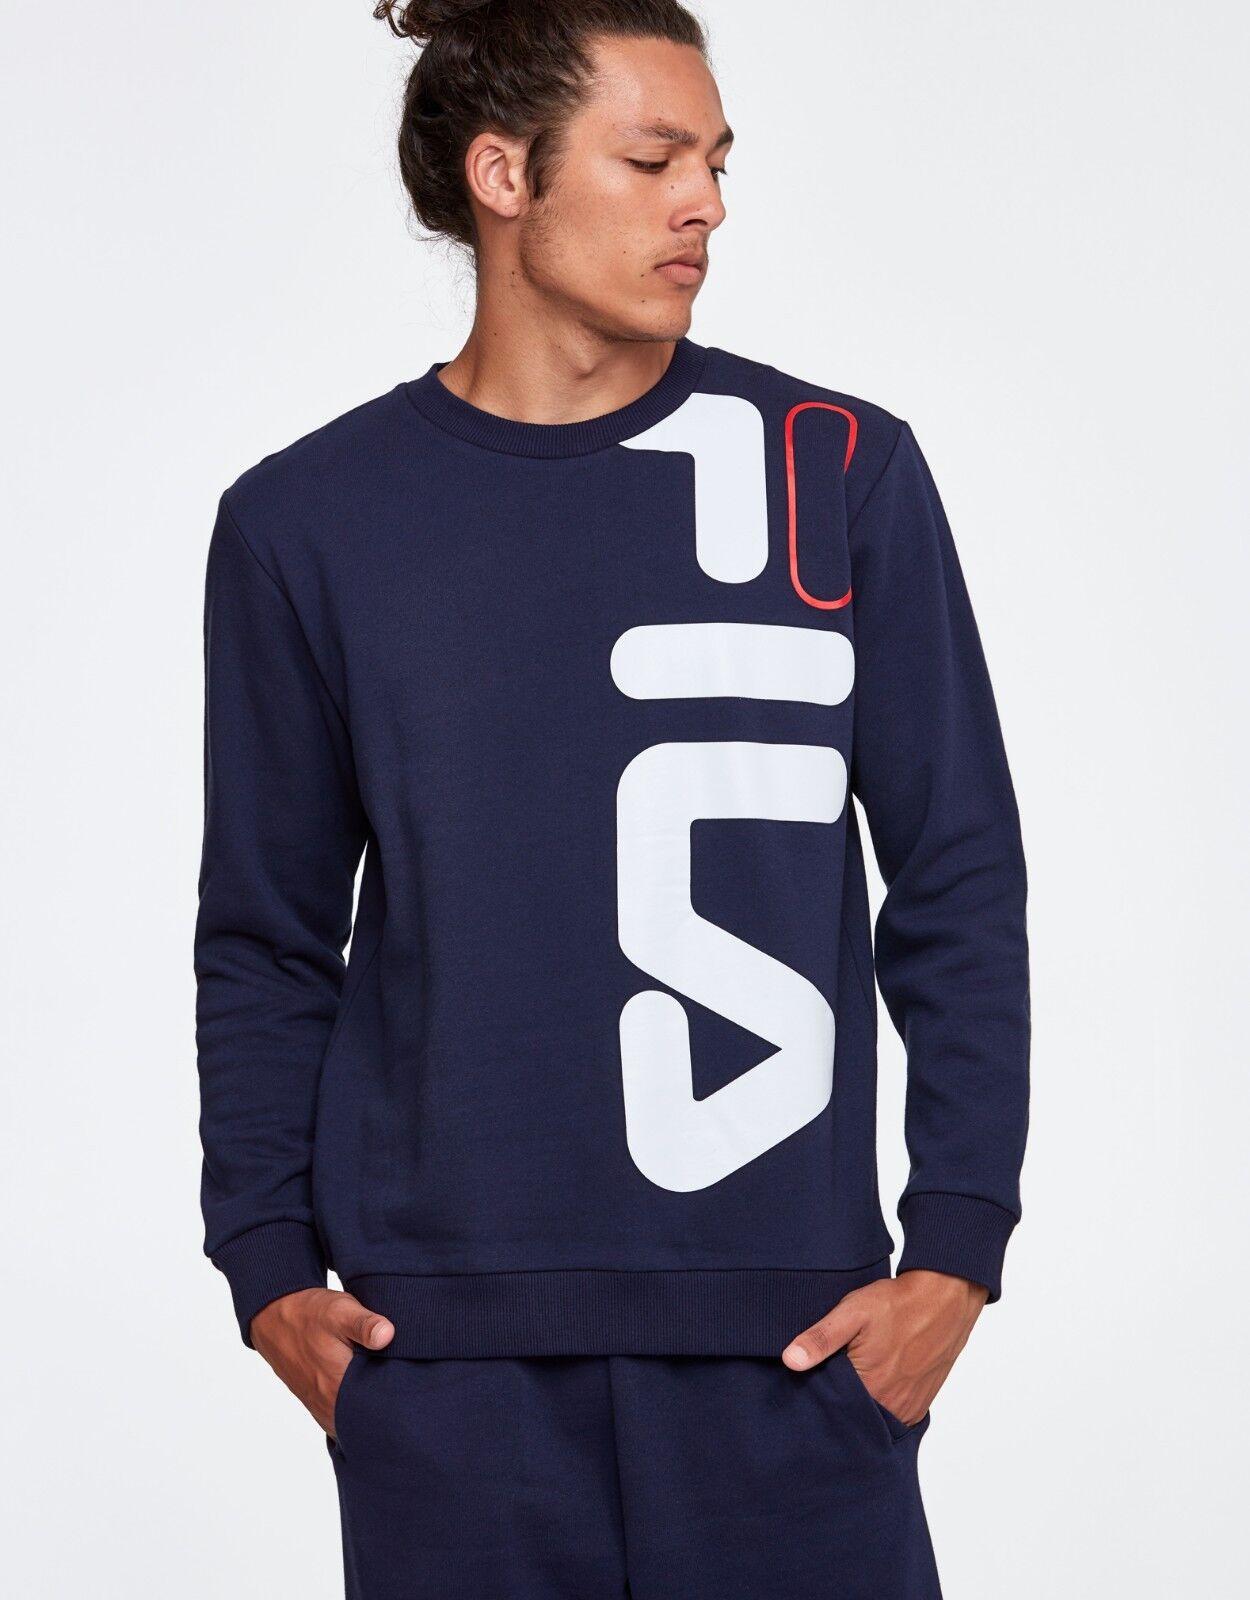 Fila Heritage Empire Crew Sweatshirt Jumper Blau Größe M Casual Fleece Top